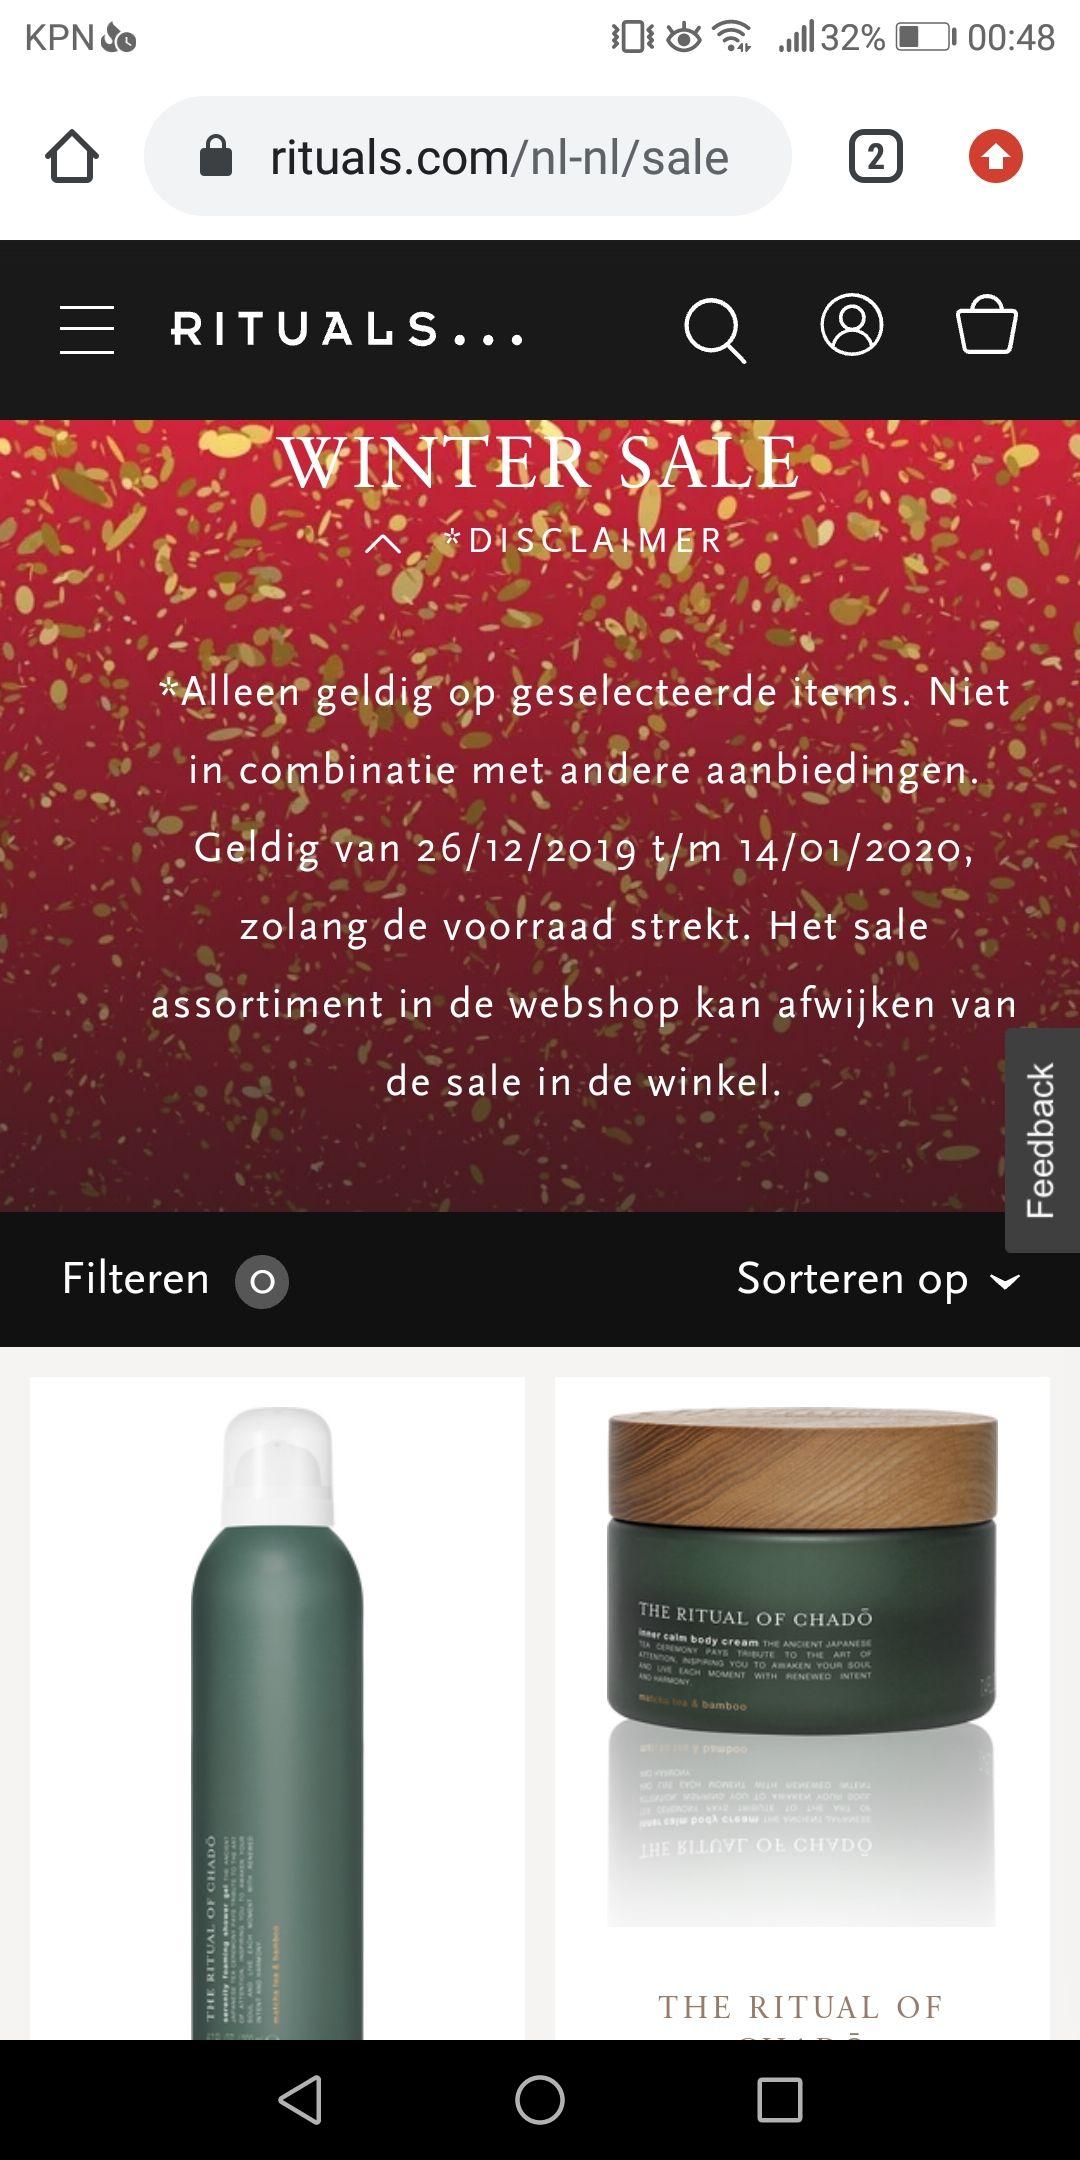 Rituals Winter Sale op rituals.nl ook restje Yalda en Chado!